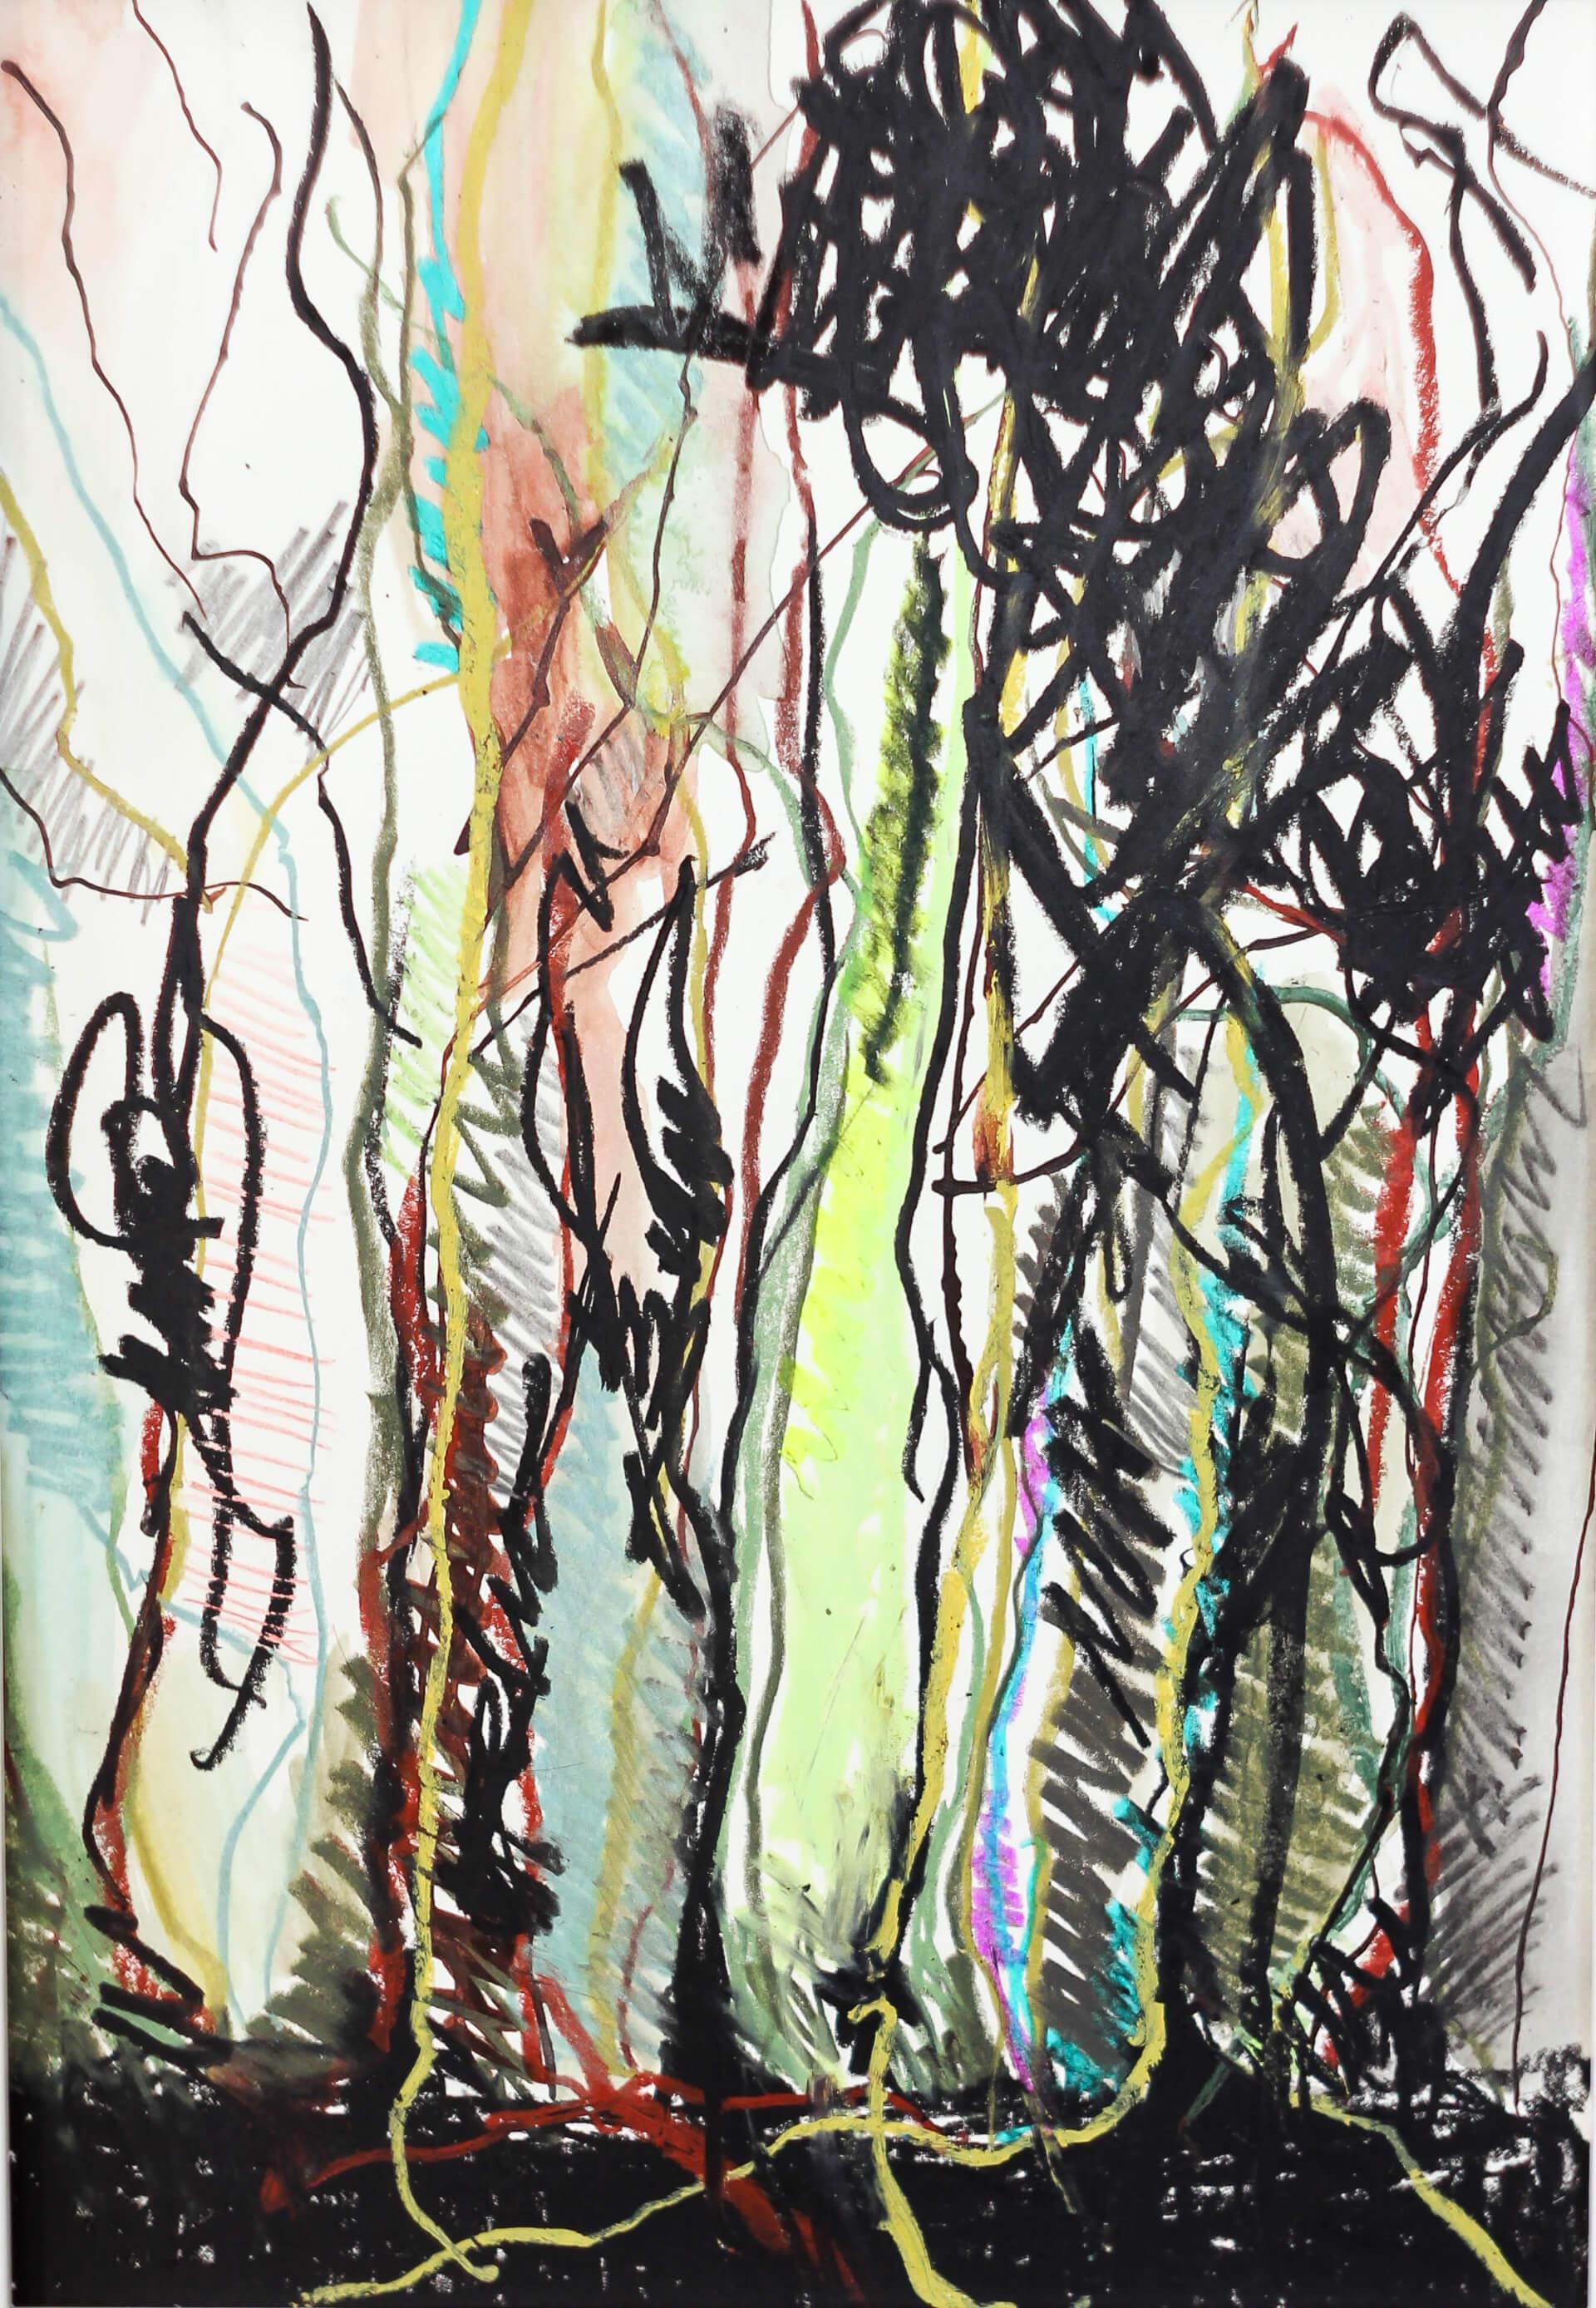 Katharina Albers, Wald III, 2014, Ölkreide, Tusche, Aquarell, Graphit auf Papier, 29,7×21 cm